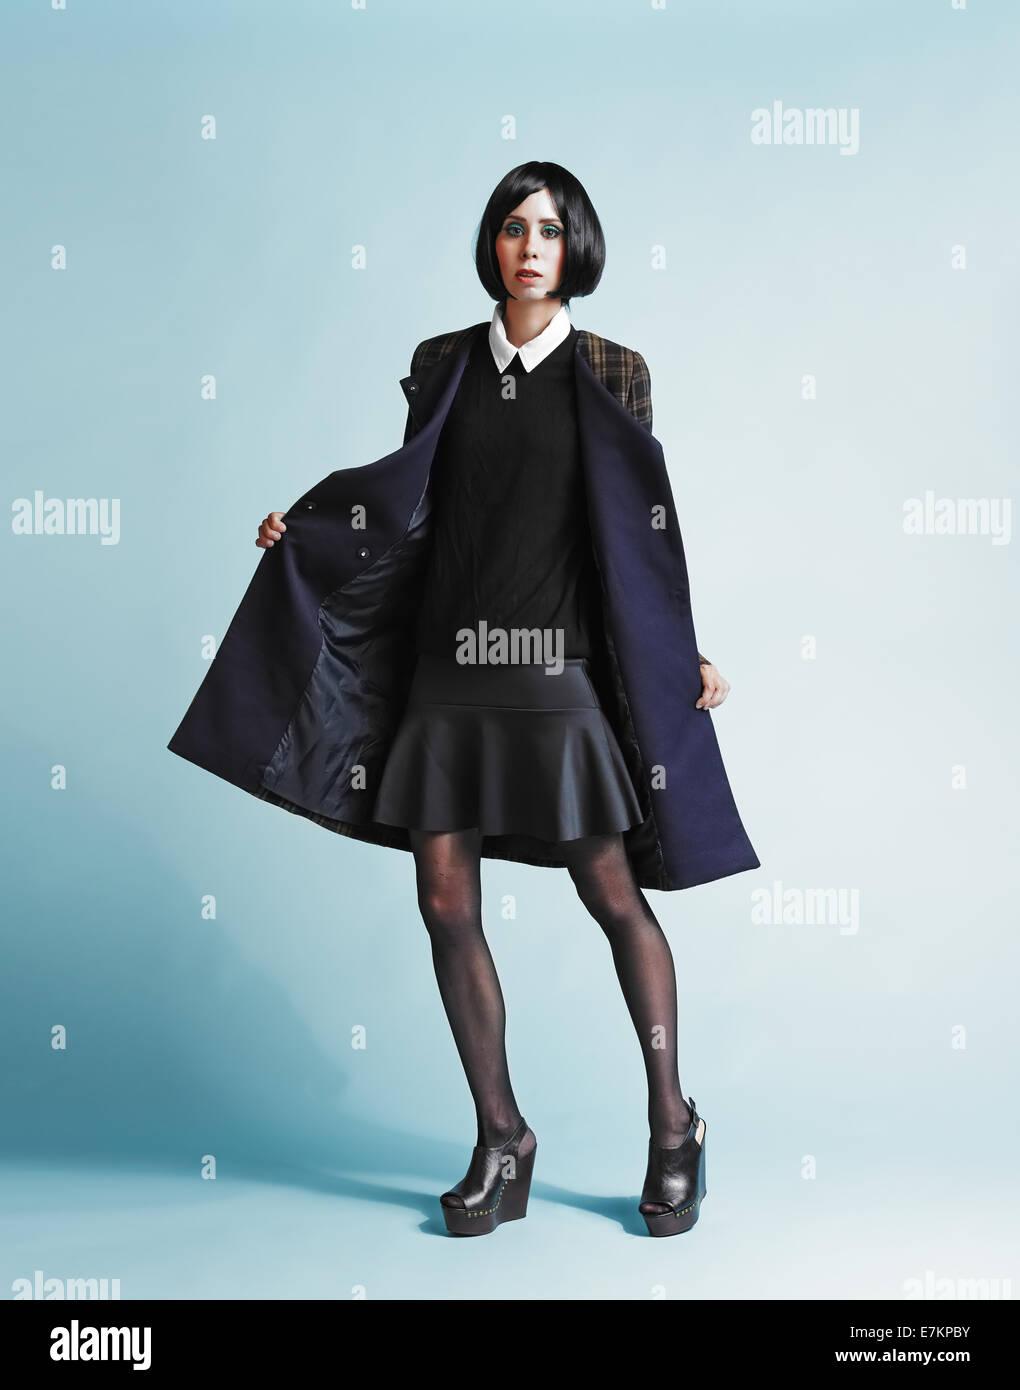 Full length portrait of beautiful young woman wearing an overcoat - studio shot - Stock Image